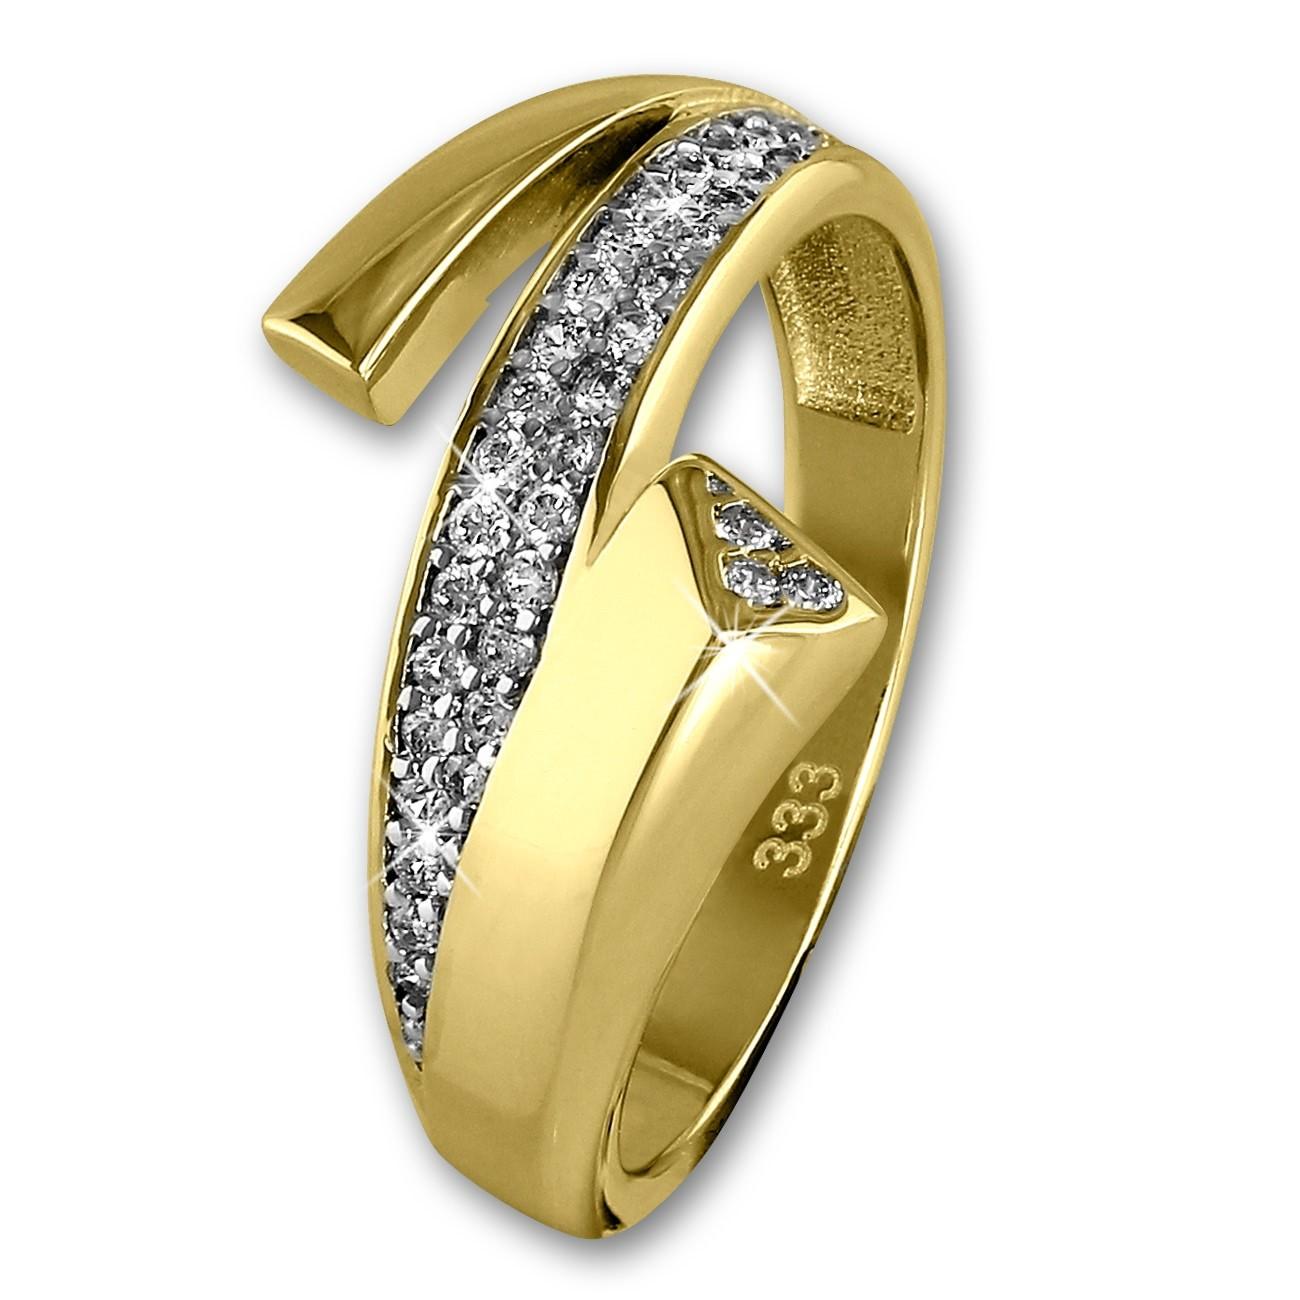 GoldDream Gold Ring Glamour Zirkonia weiß Gr.54 333er Gelbgold GDR513Y54